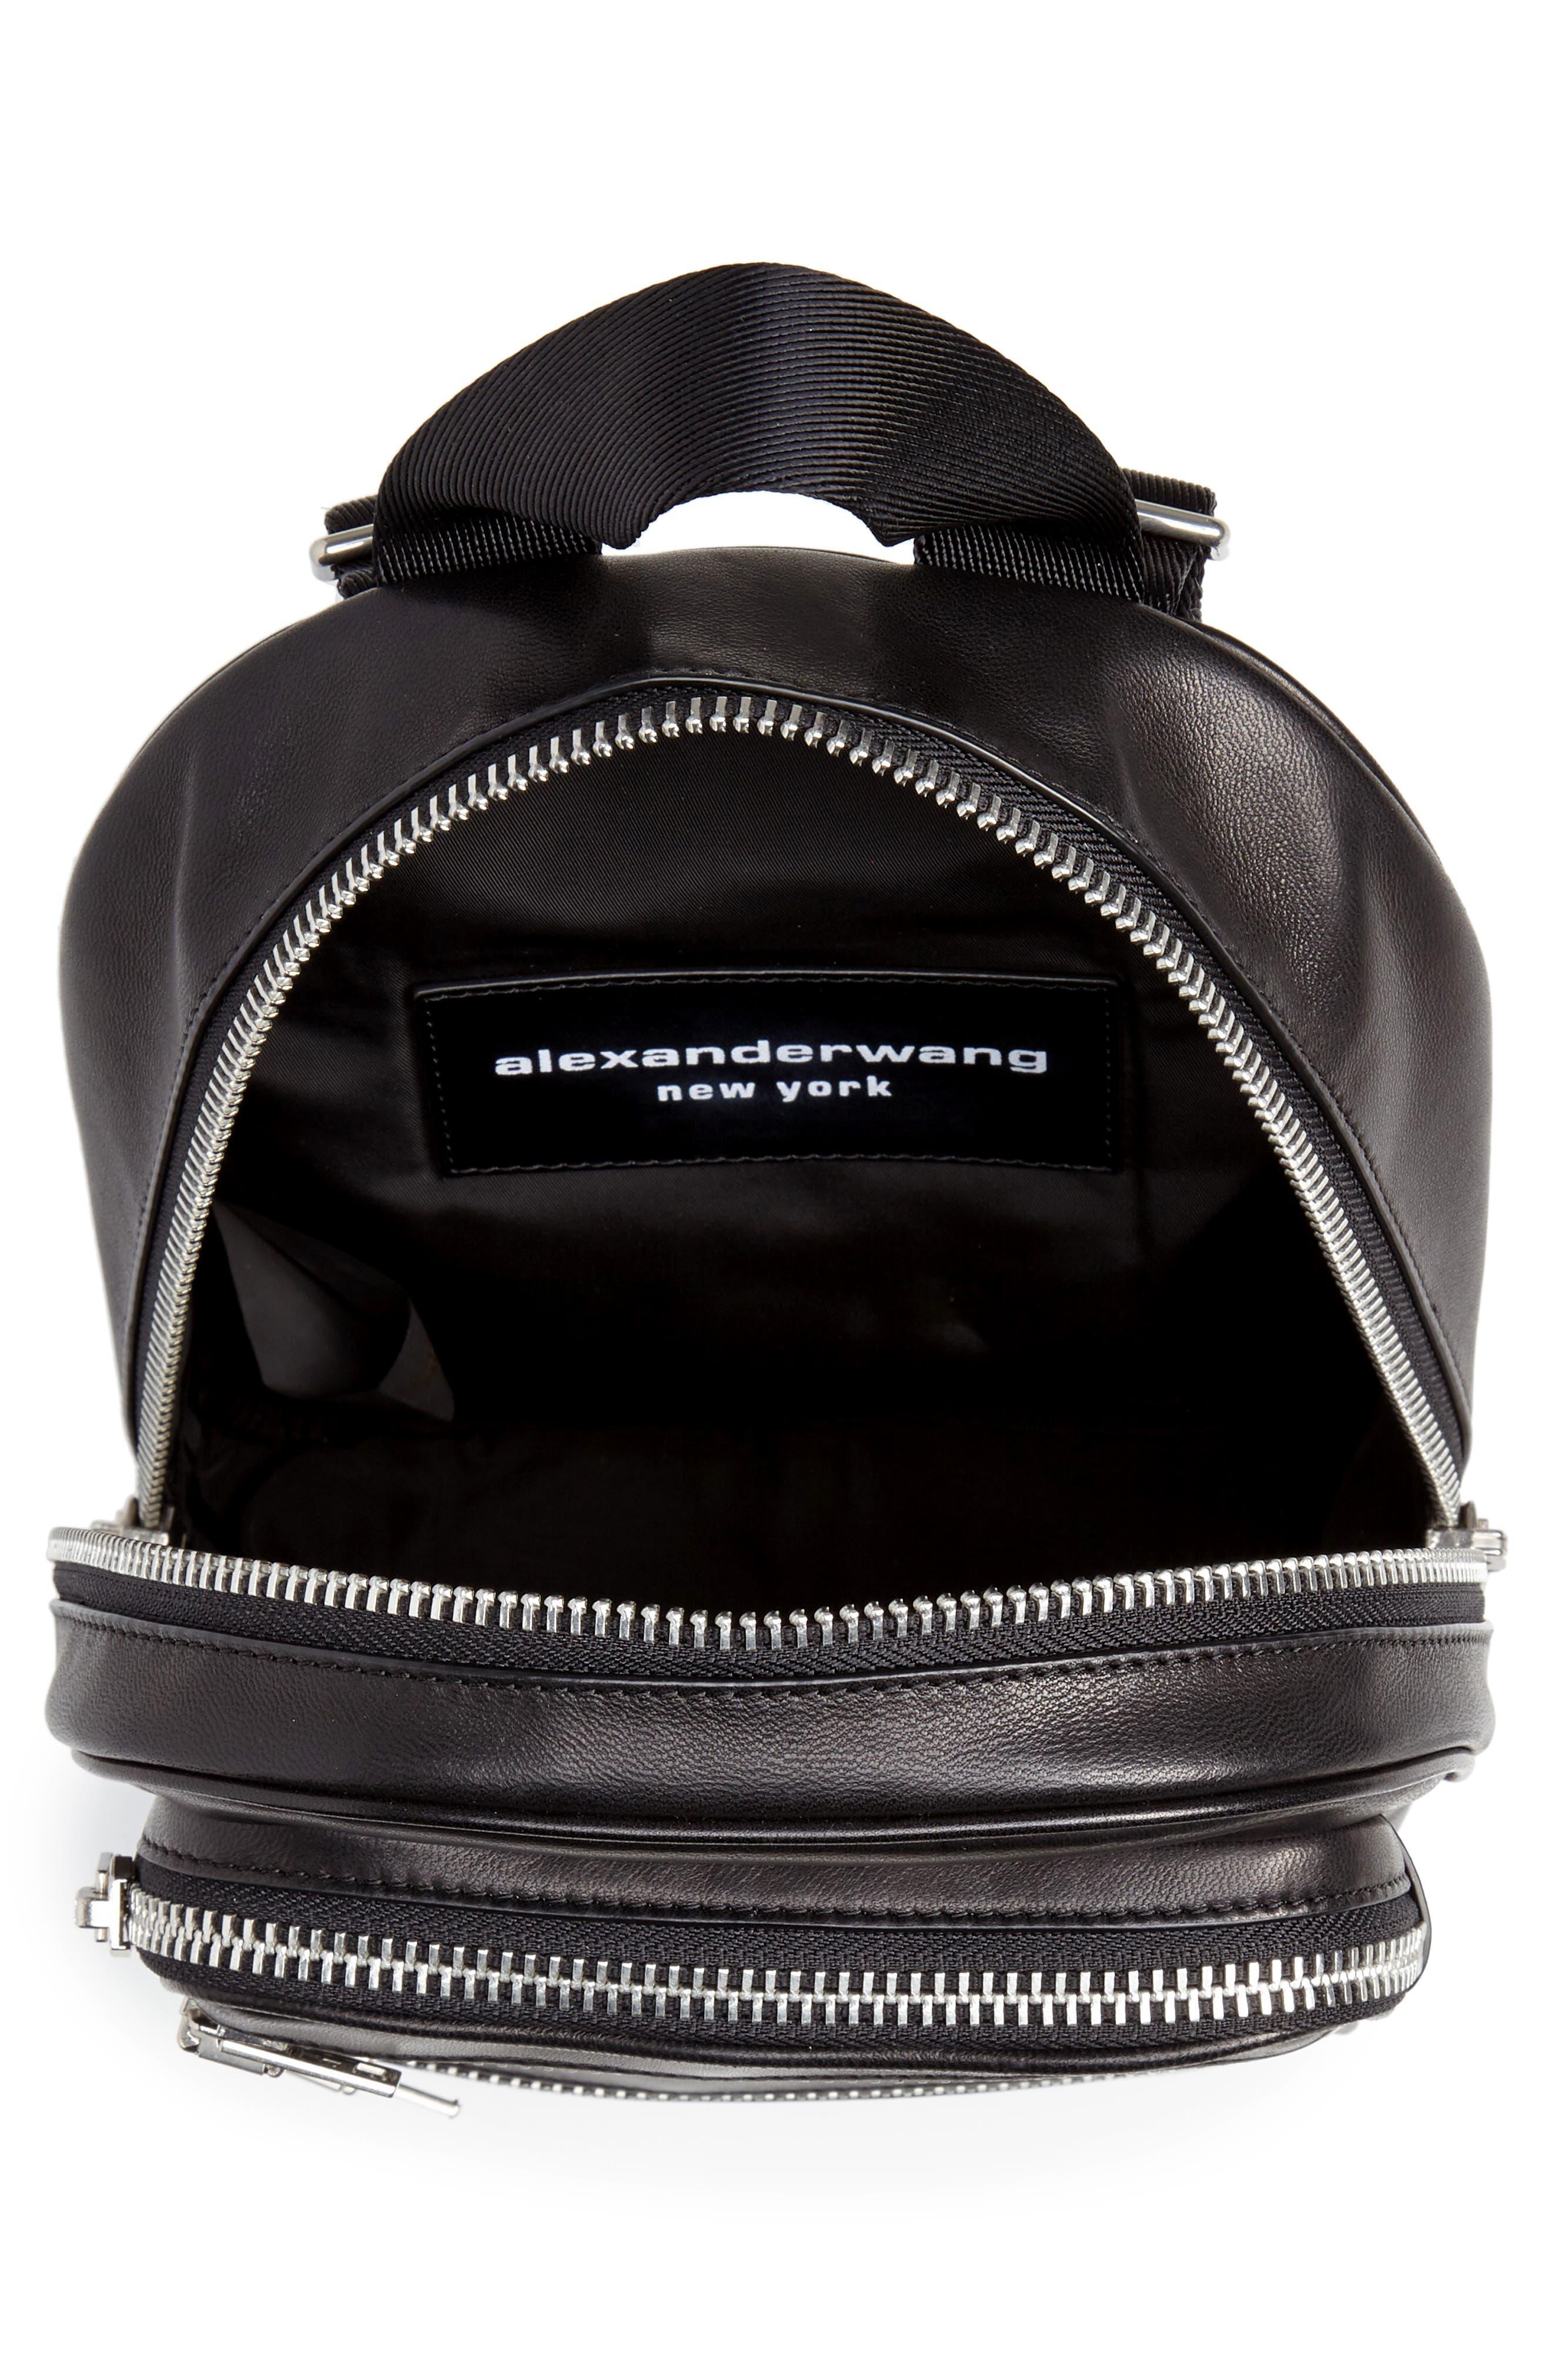 ALEXANDER WANG, Attica Lambskin Leather Backpack, Alternate thumbnail 4, color, BLACK